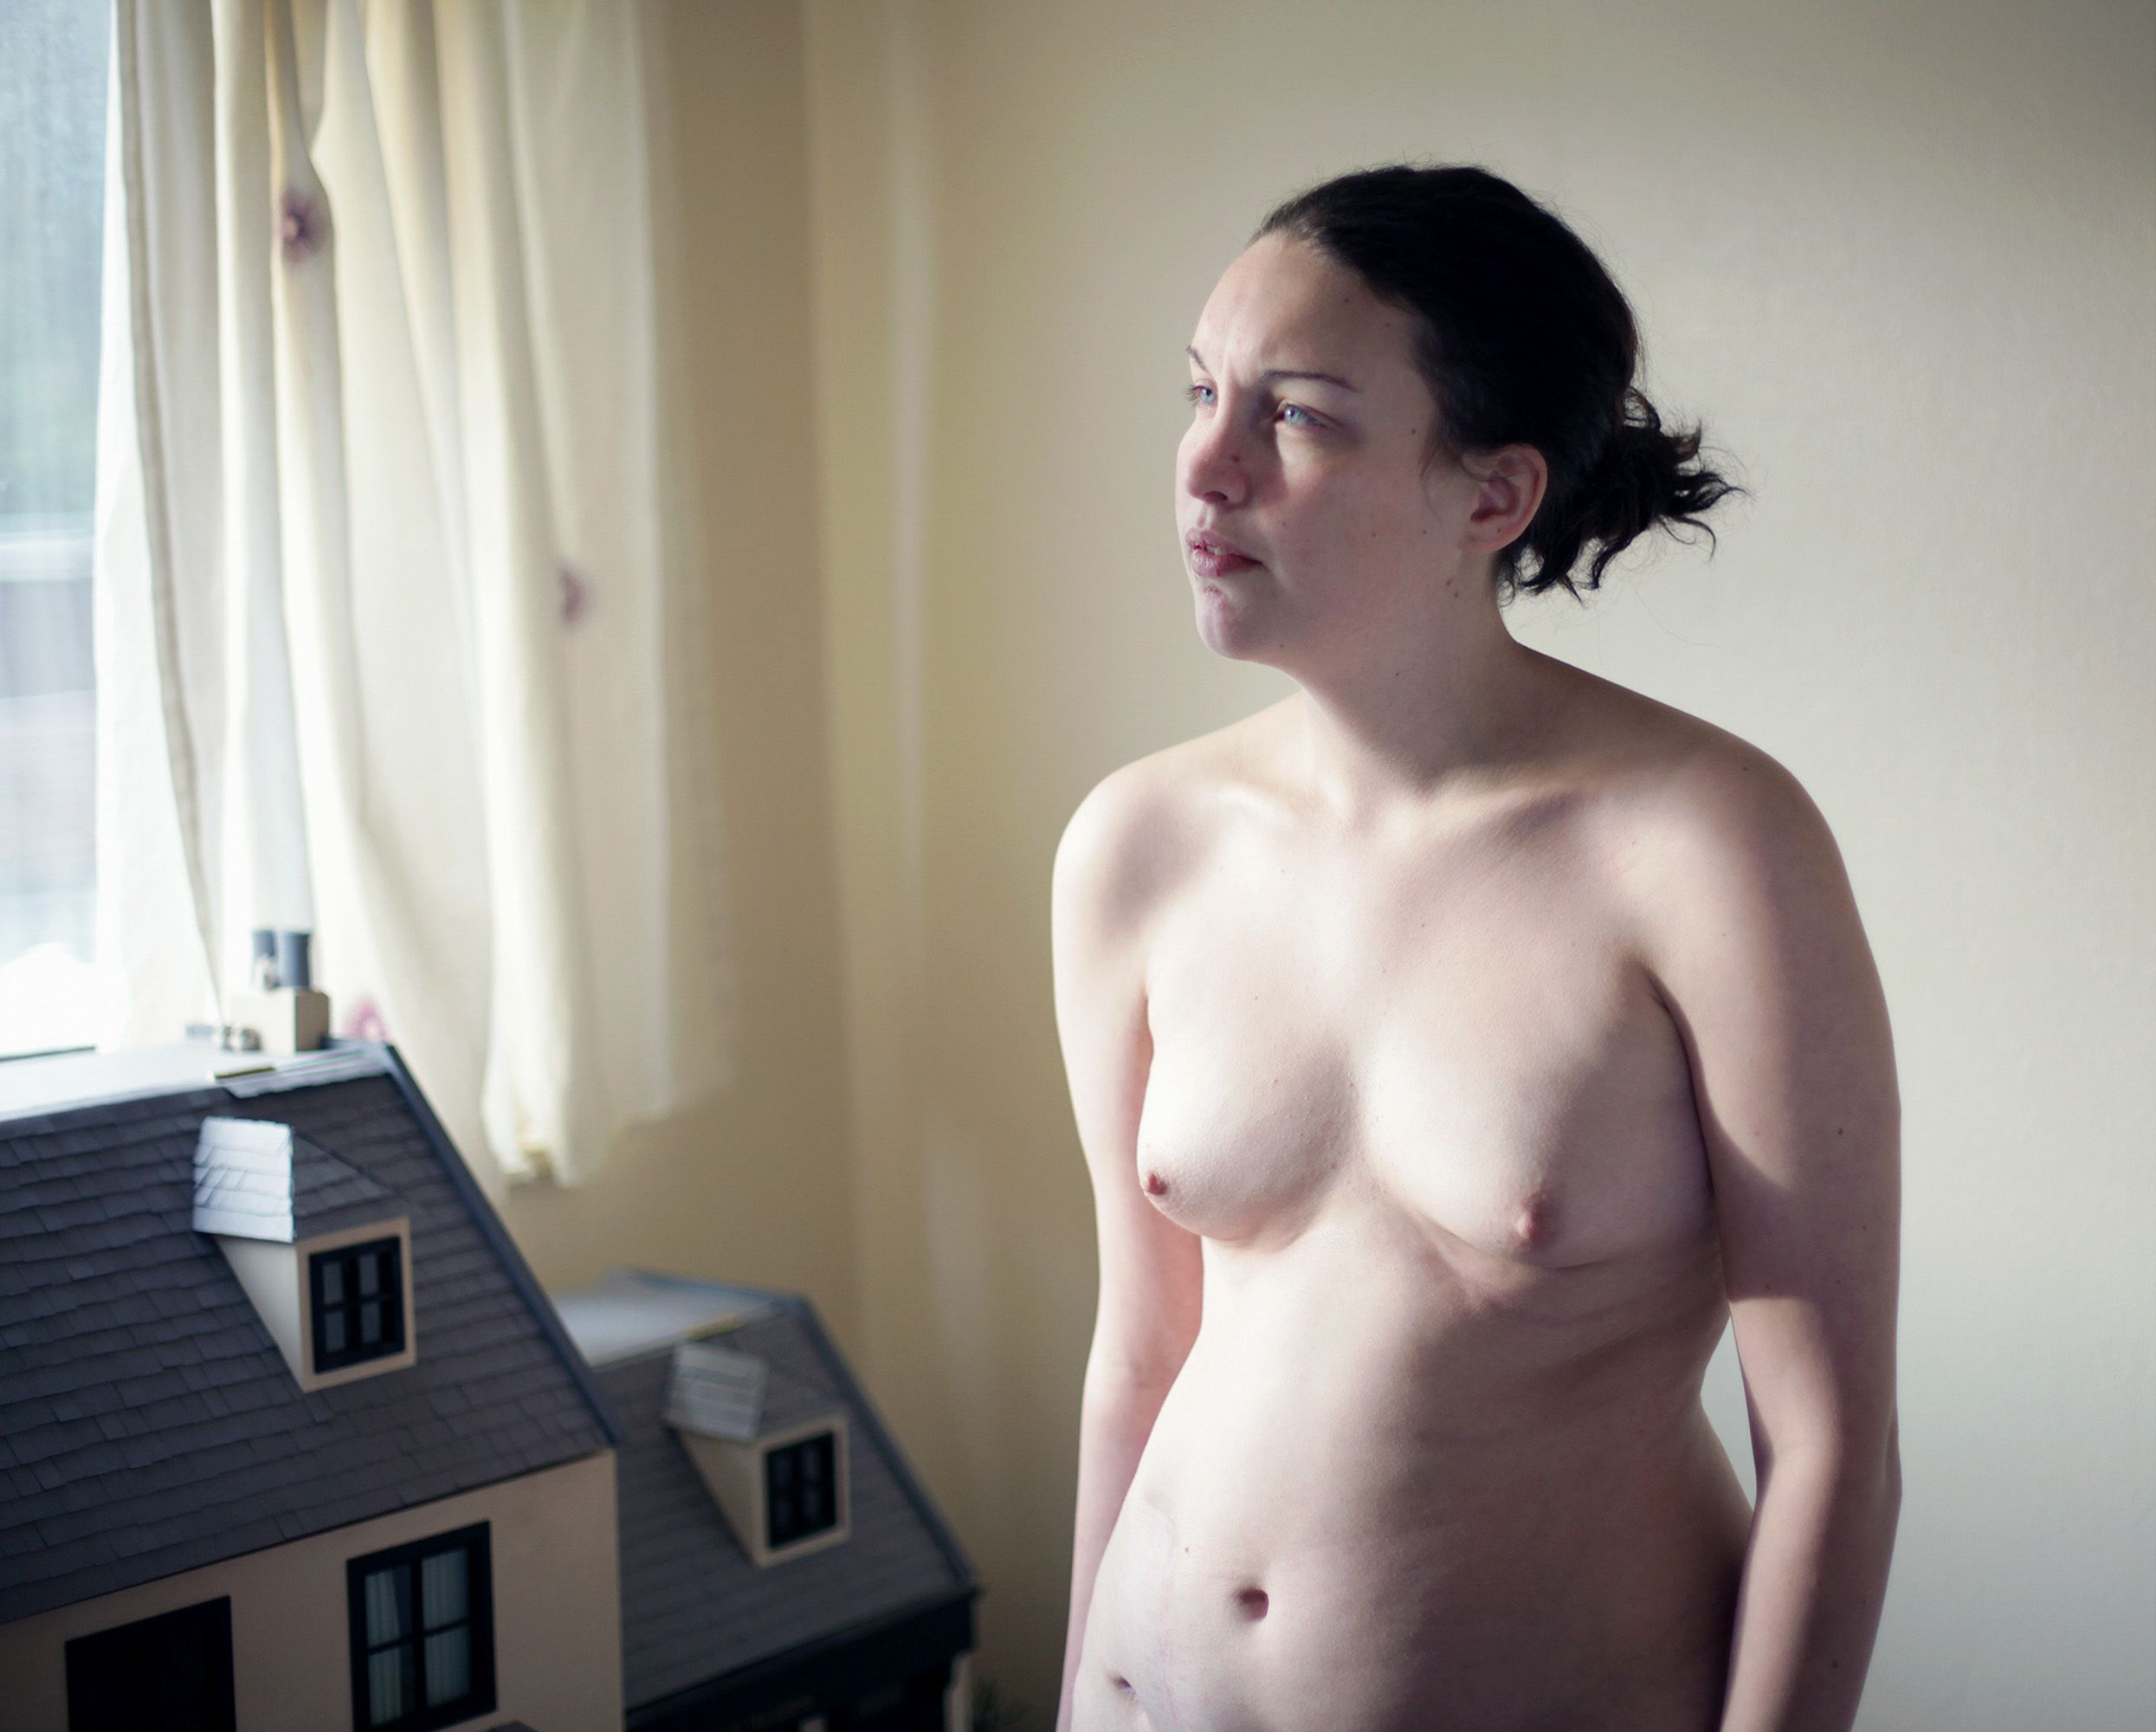 Serie camp nudist, porn dirty lesbian pee